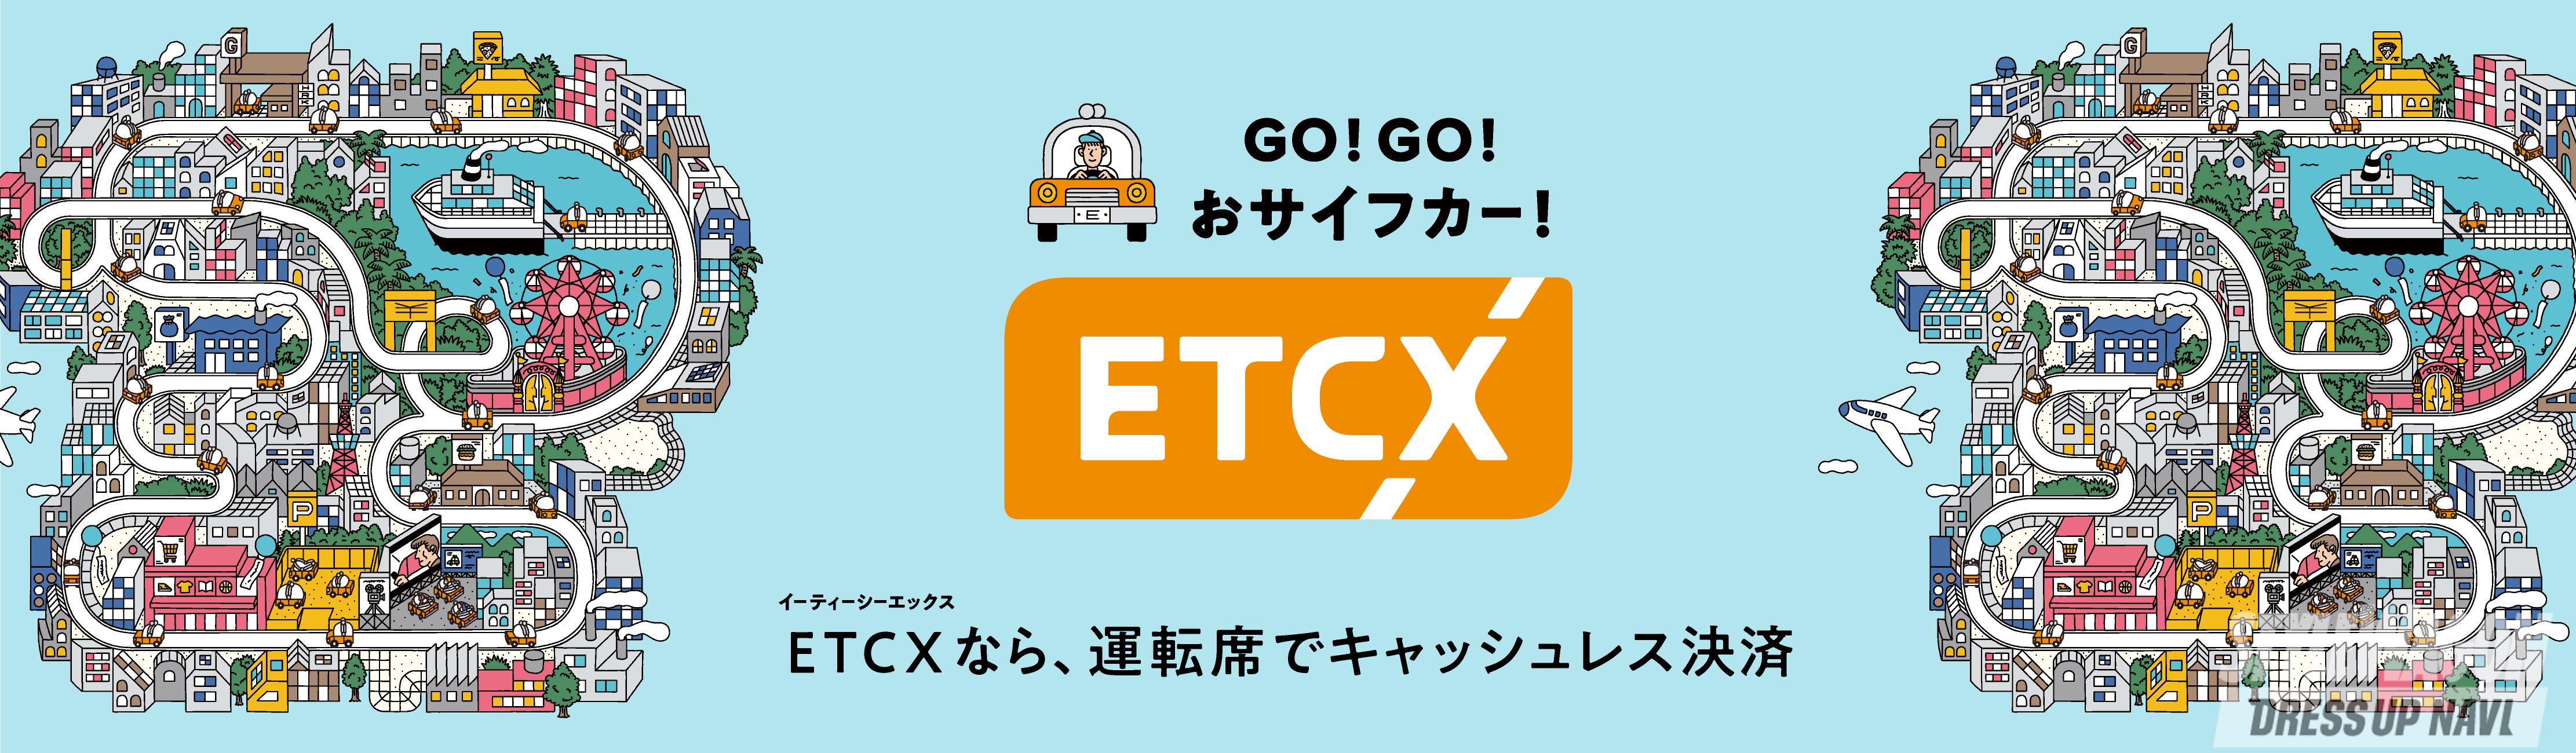 etcx 新サービス 道路 ドライブスルー